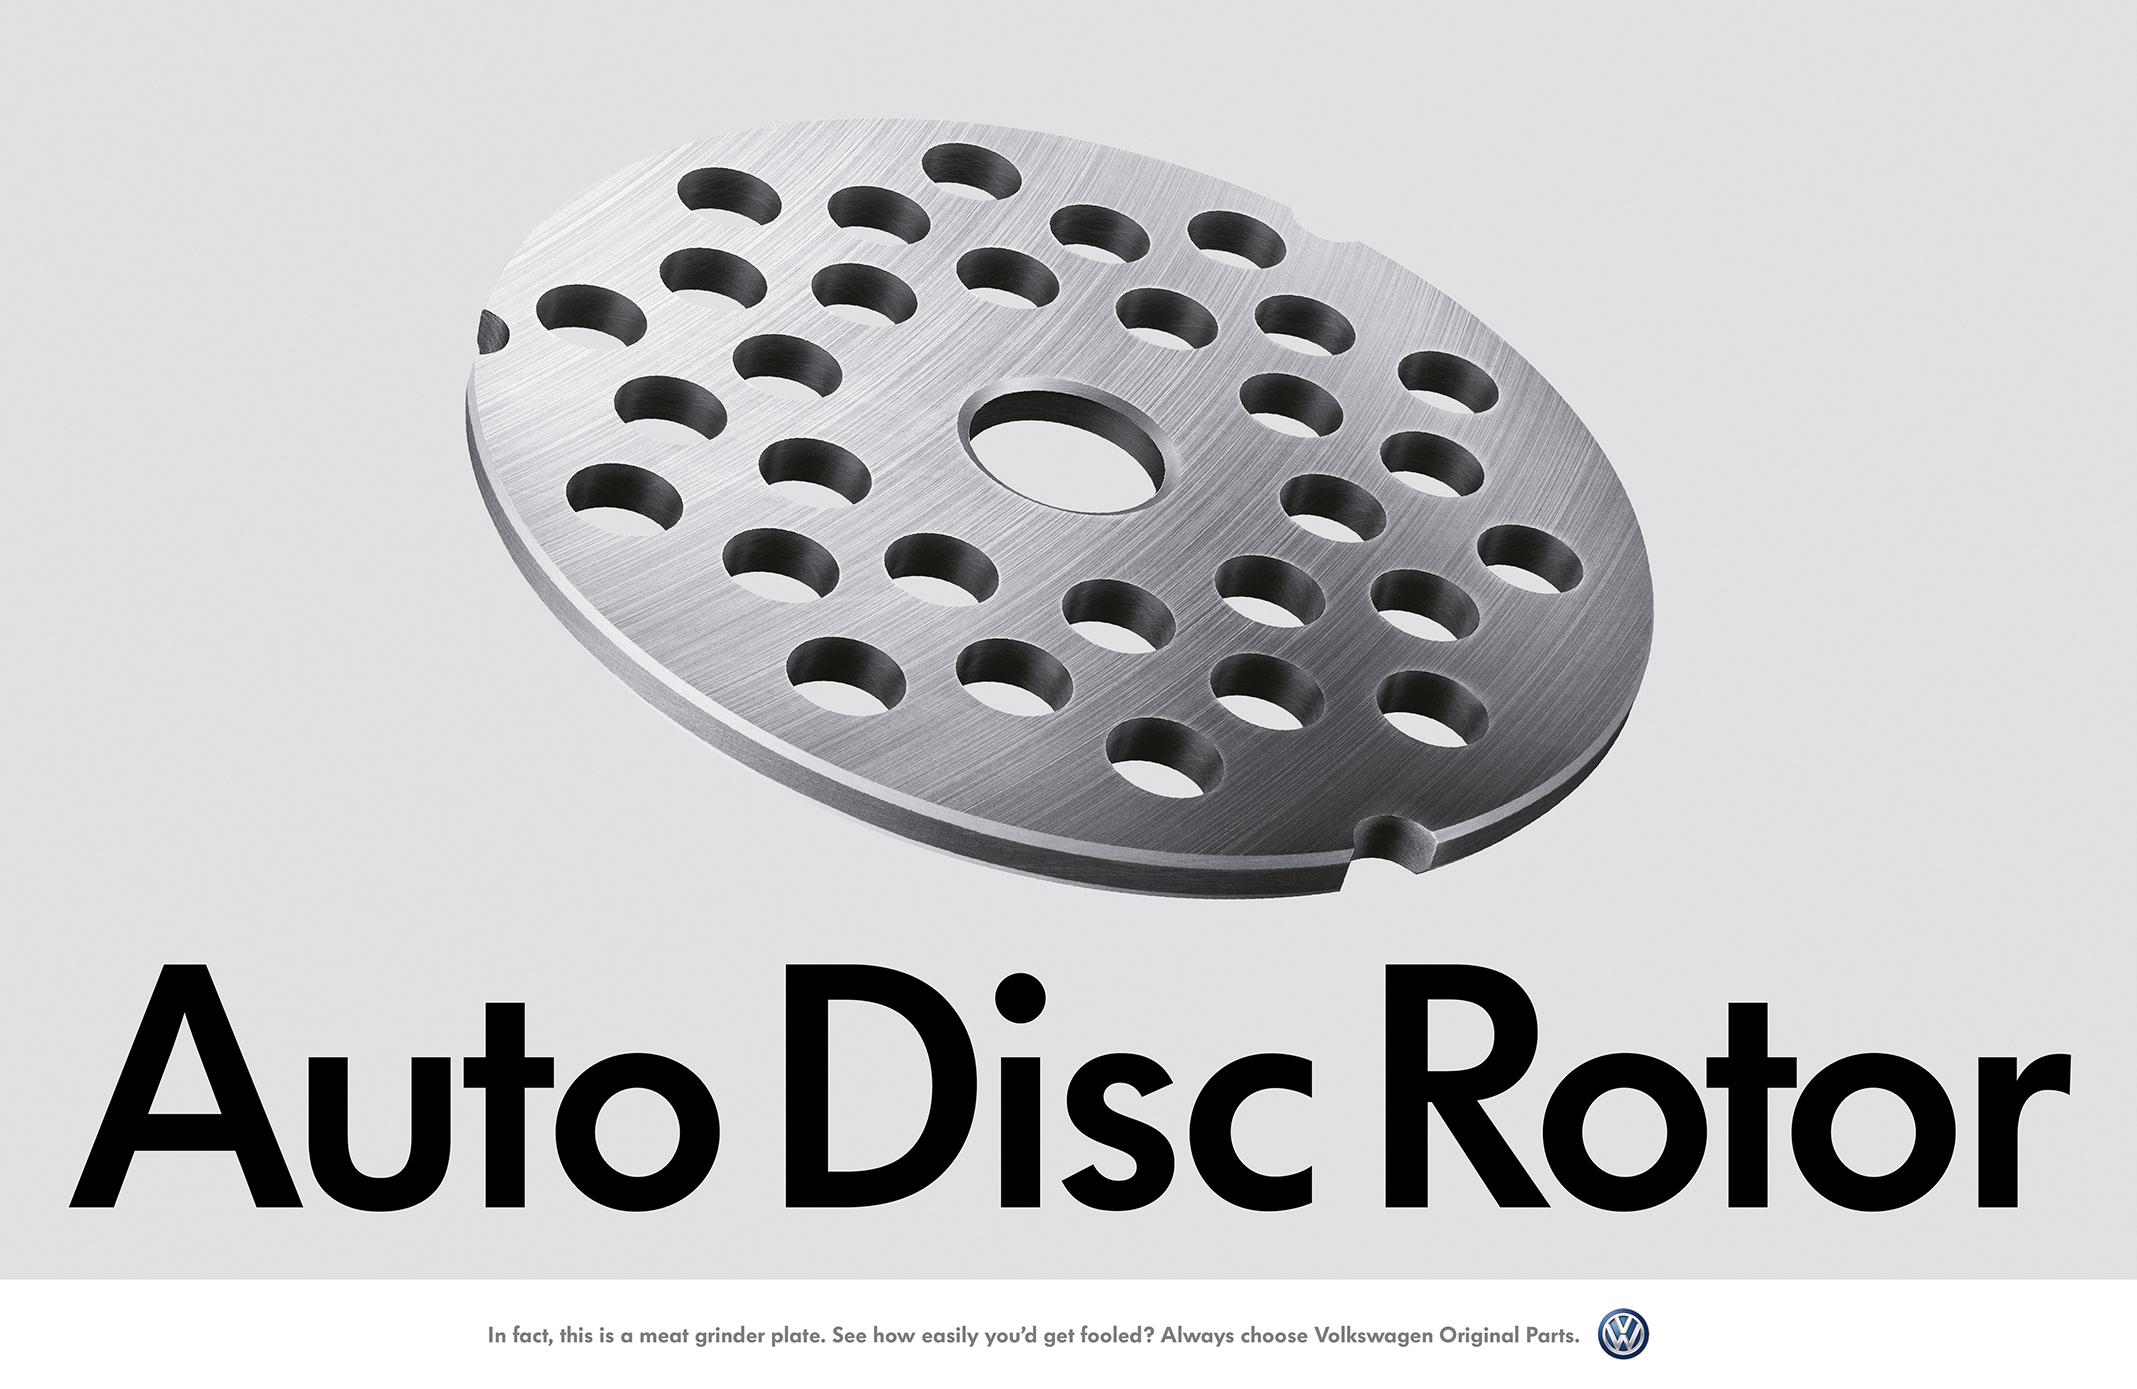 AUTO DISK ROTOR.jpg